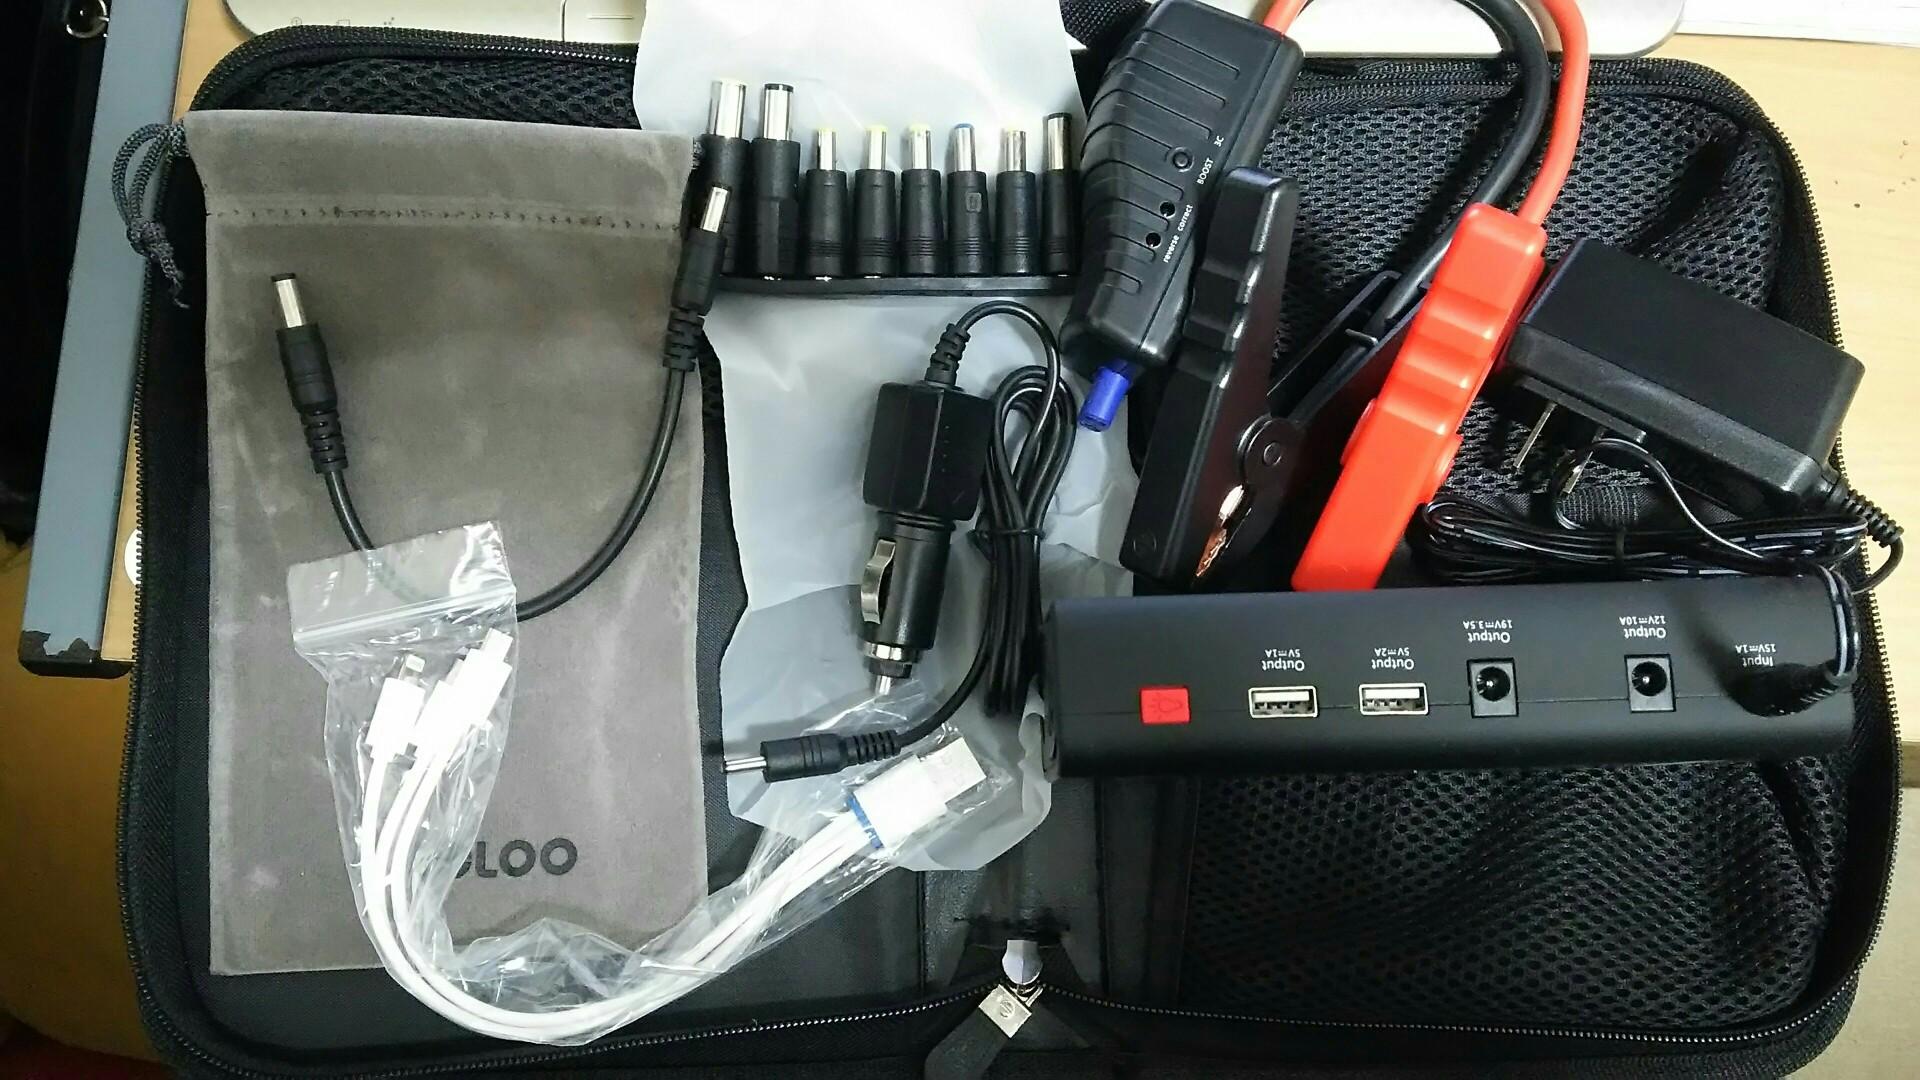 GOOLOO GOOLOOGP3715000mAhカージャンプスターター/モバイルバッテリー